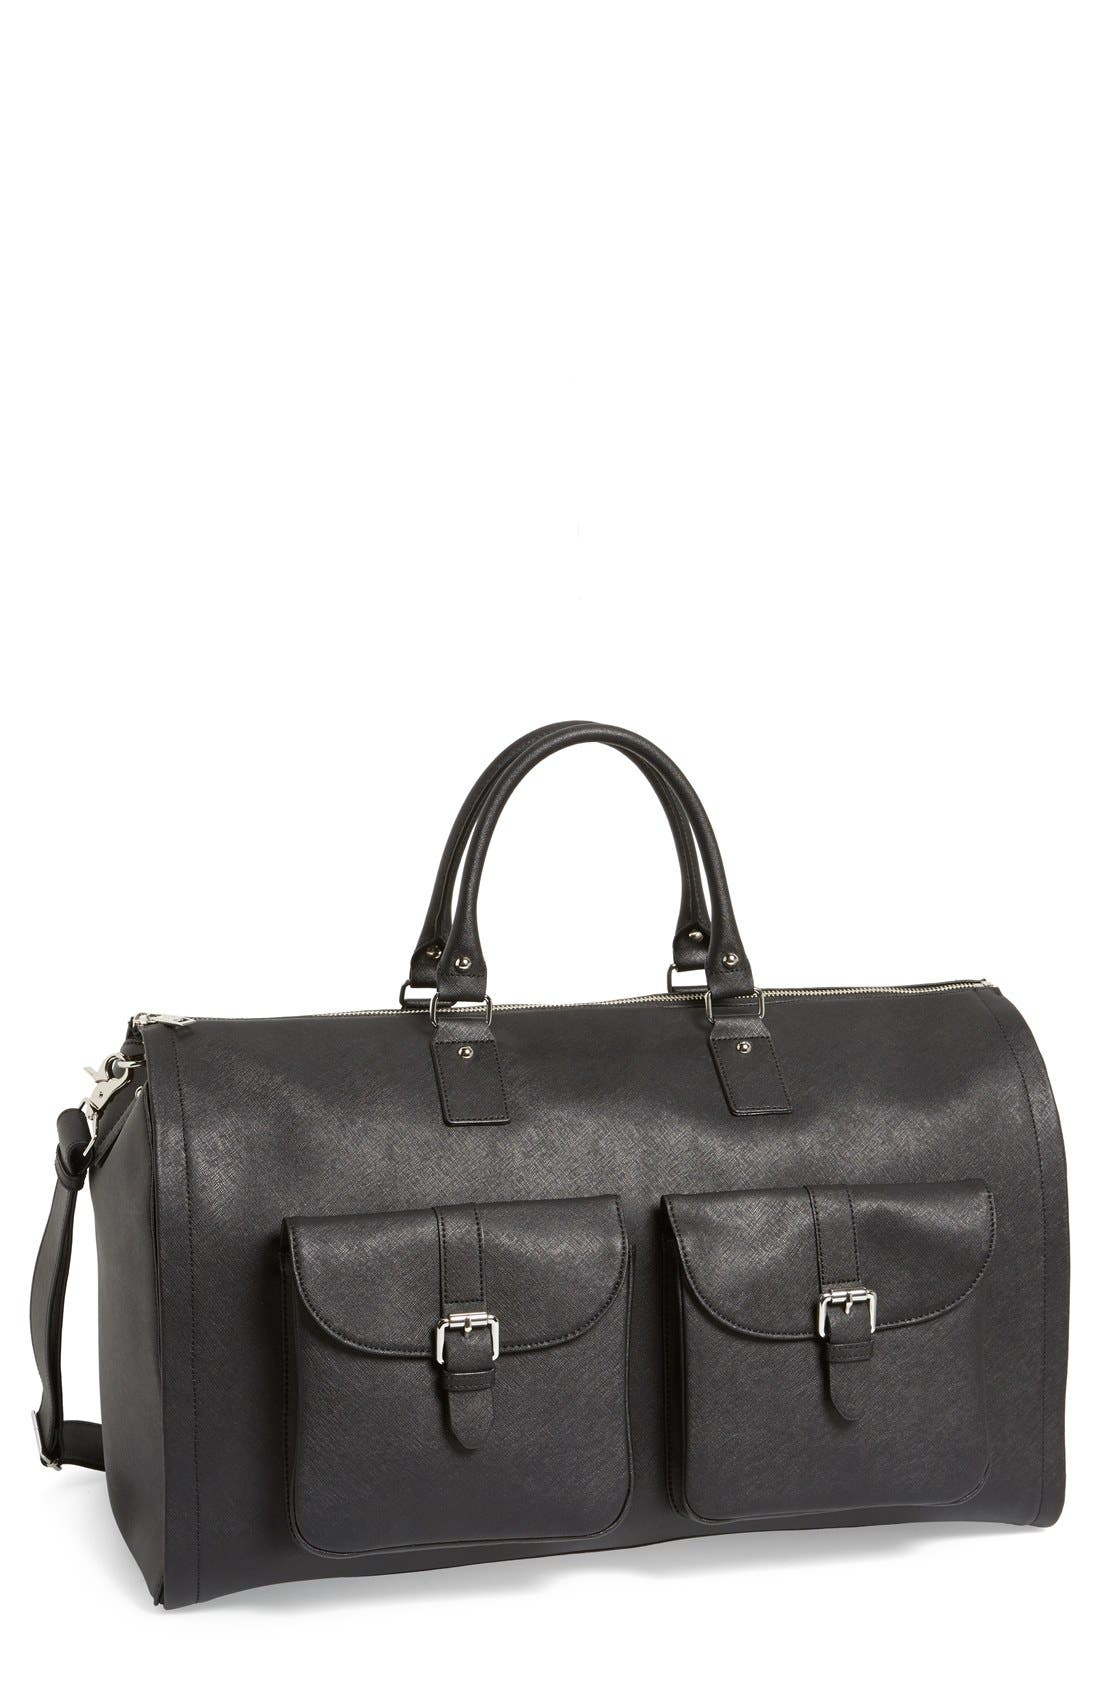 Main Image - hook + ALBERT Saffiano Leather Garment/Duffel Bag